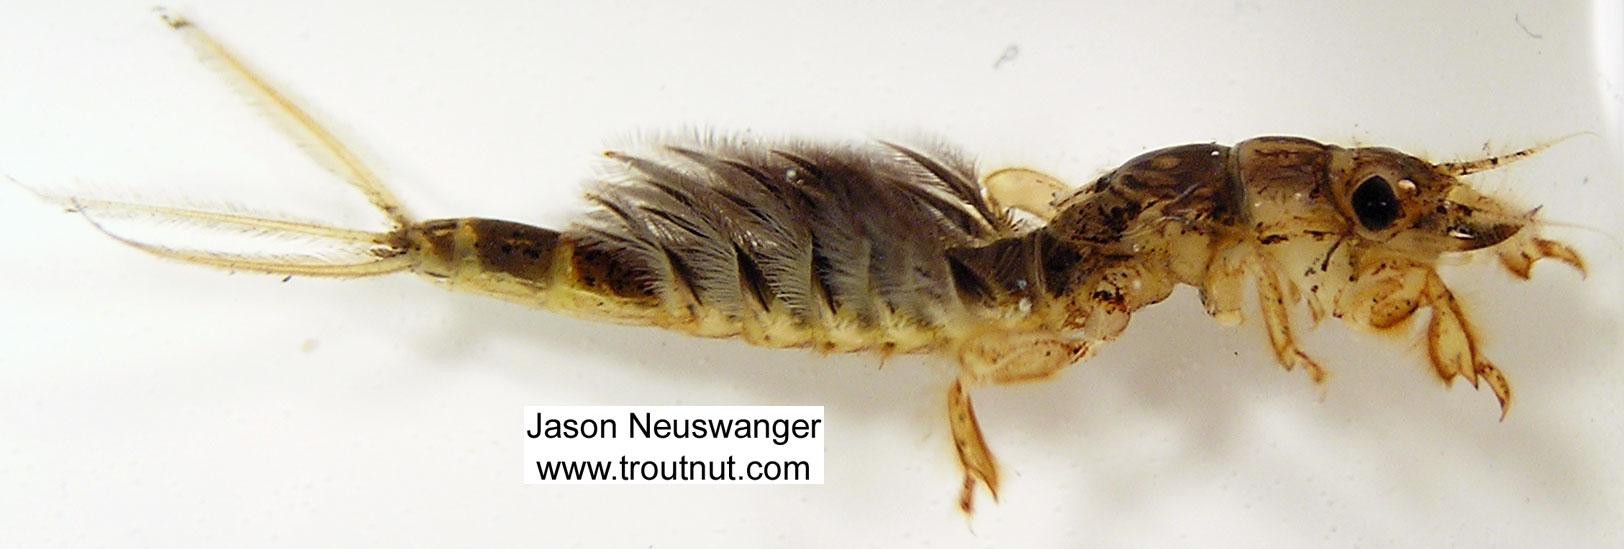 Hexagenia limbata (Hex) Mayfly Nymph from Big Brook in Wisconsin